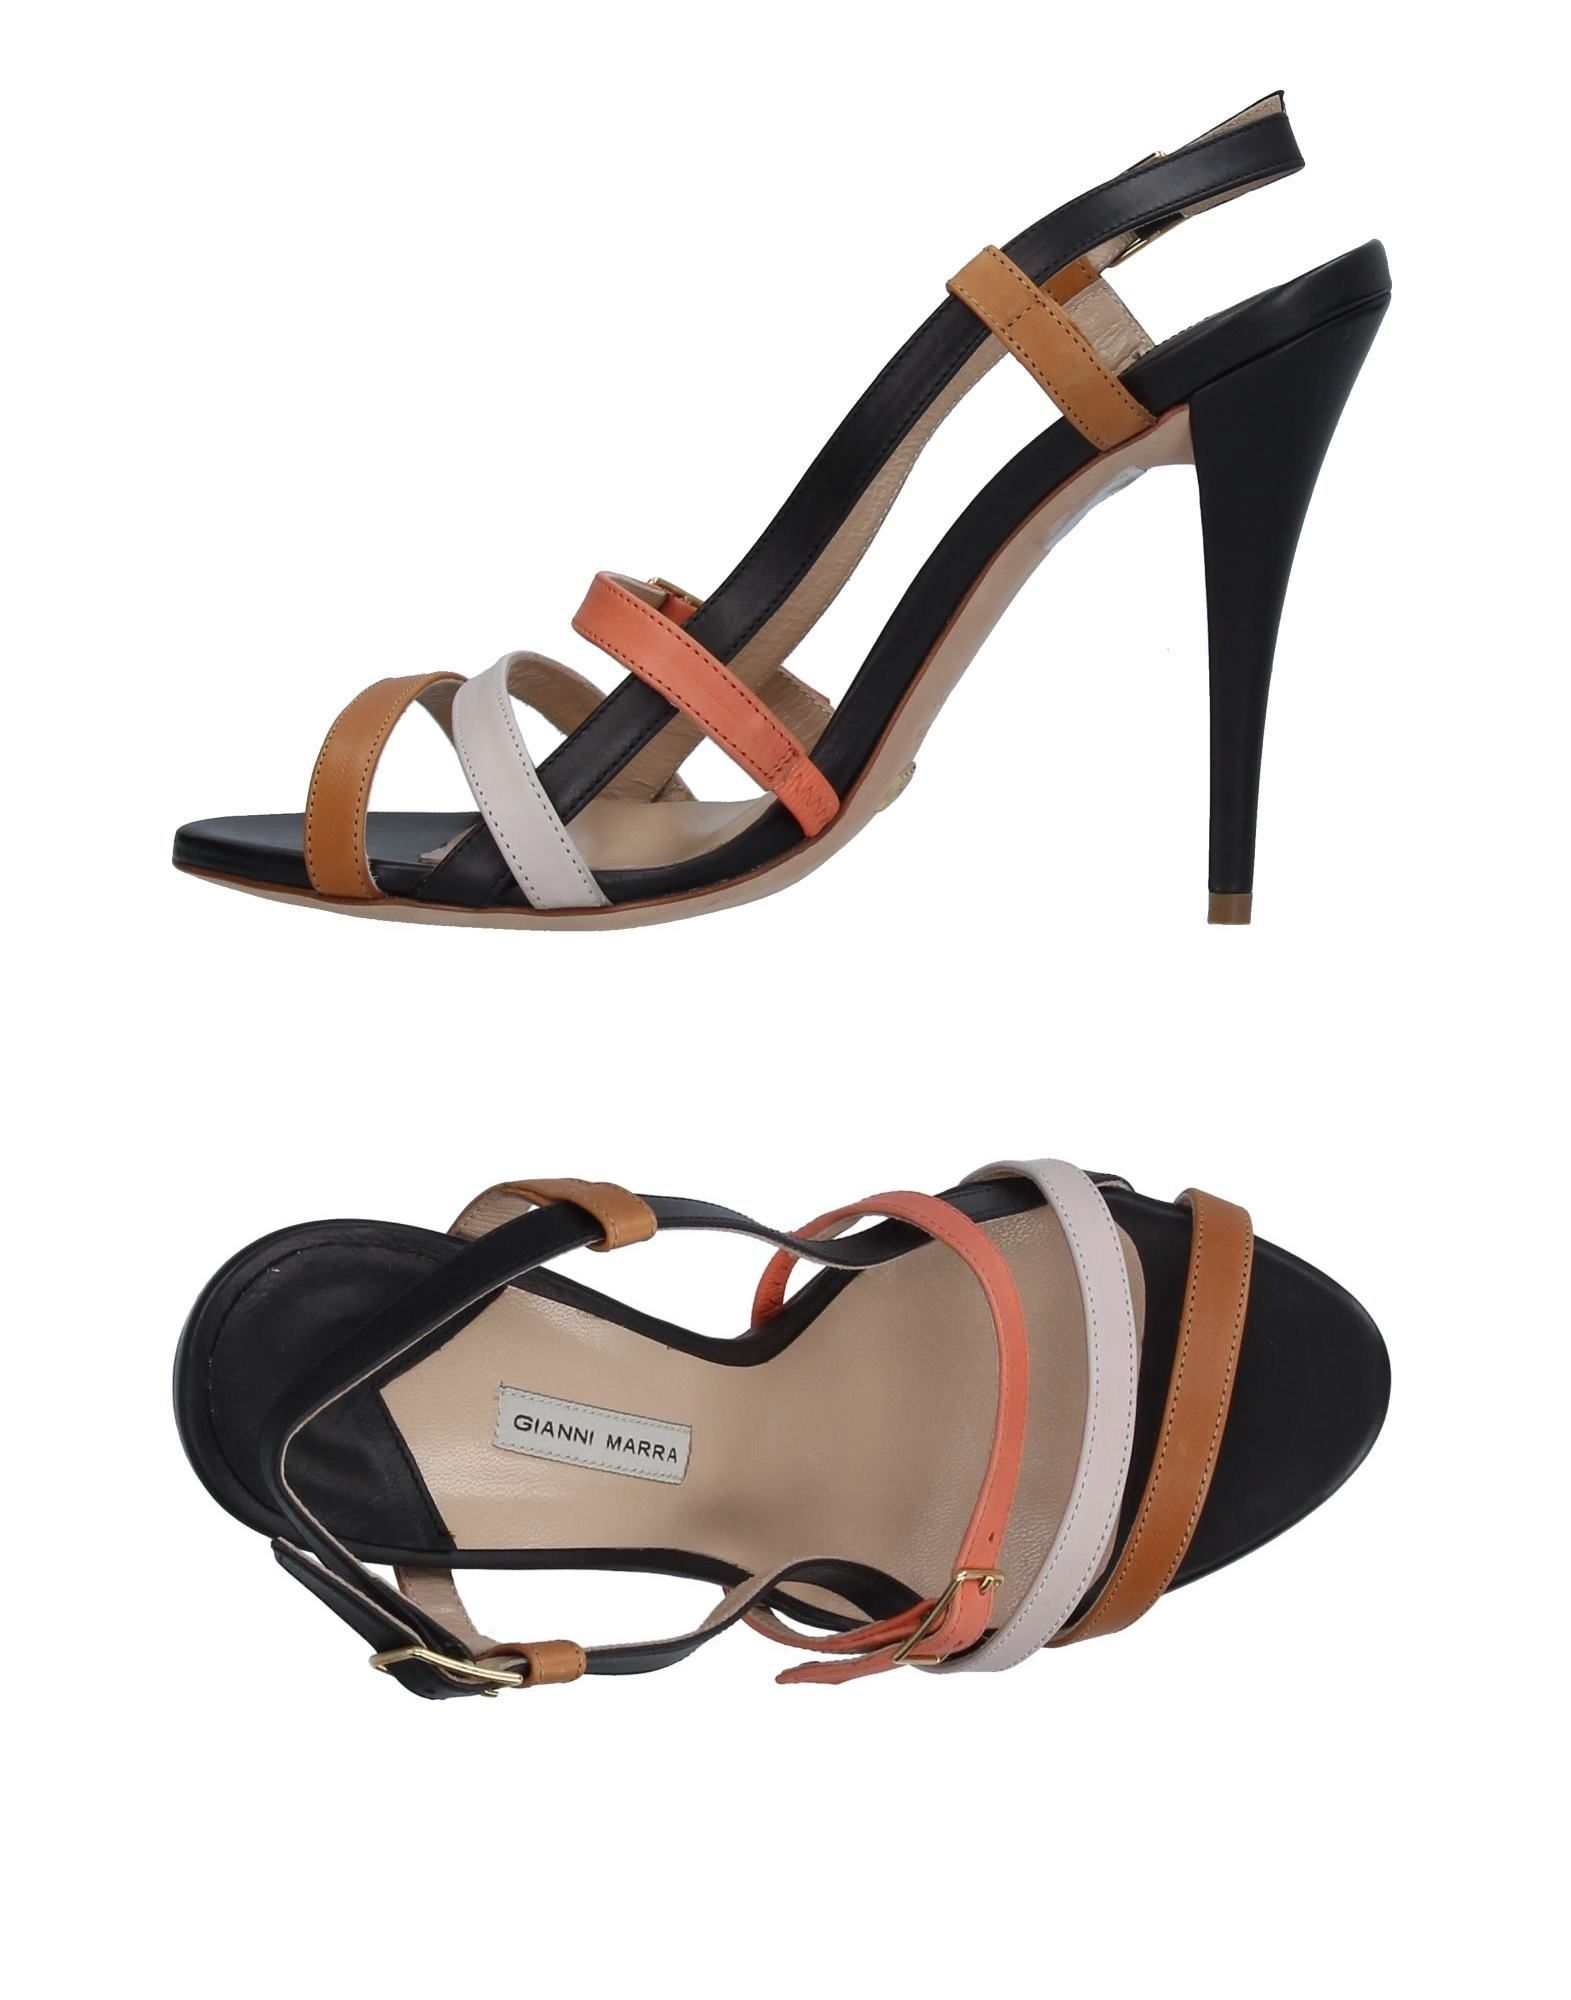 Gianni Marra Sandalen Damen  11358819QX Gute Qualität beliebte Schuhe